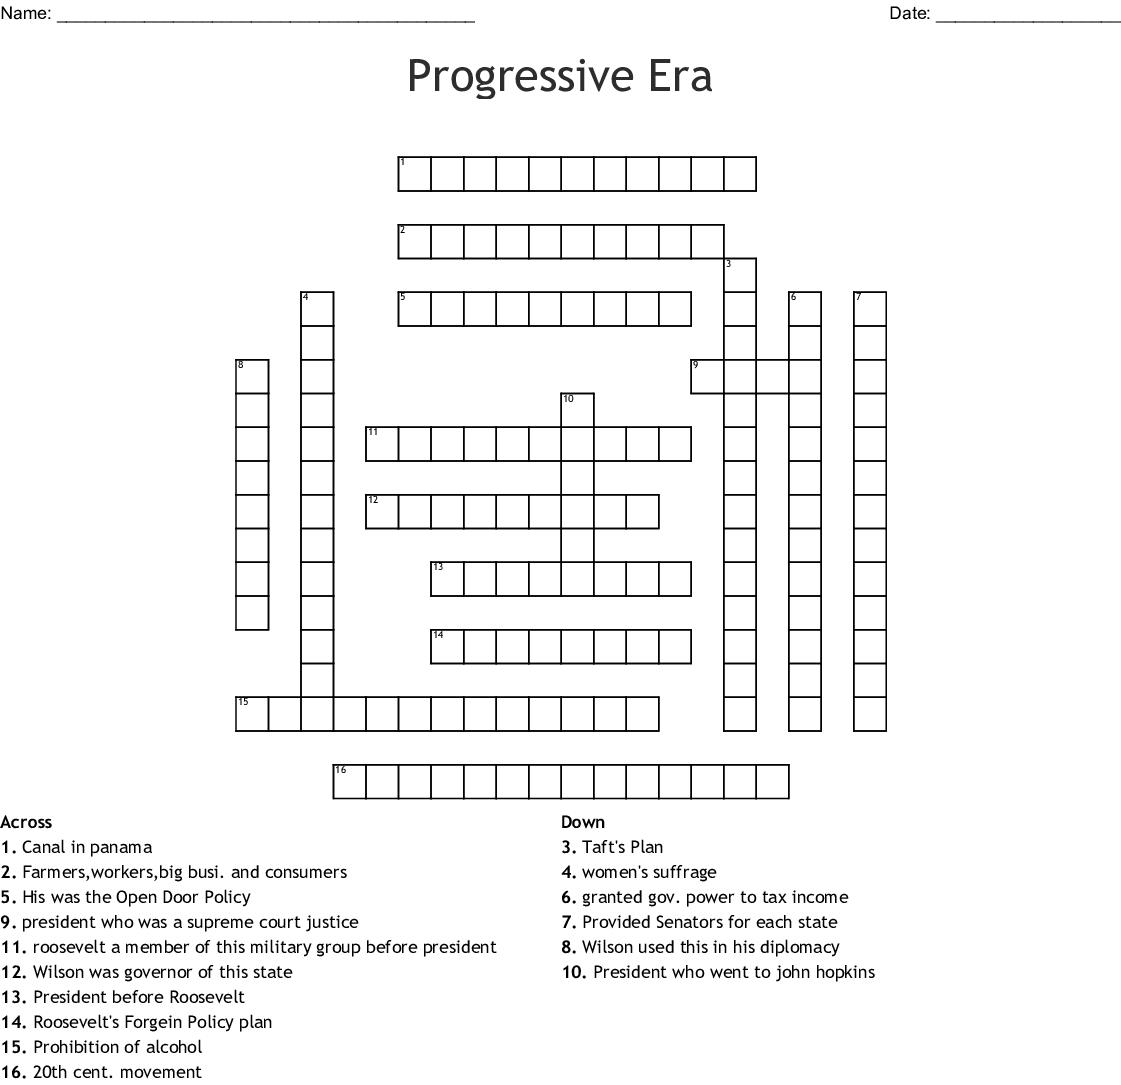 The Progressive Era Worksheet Answer Key